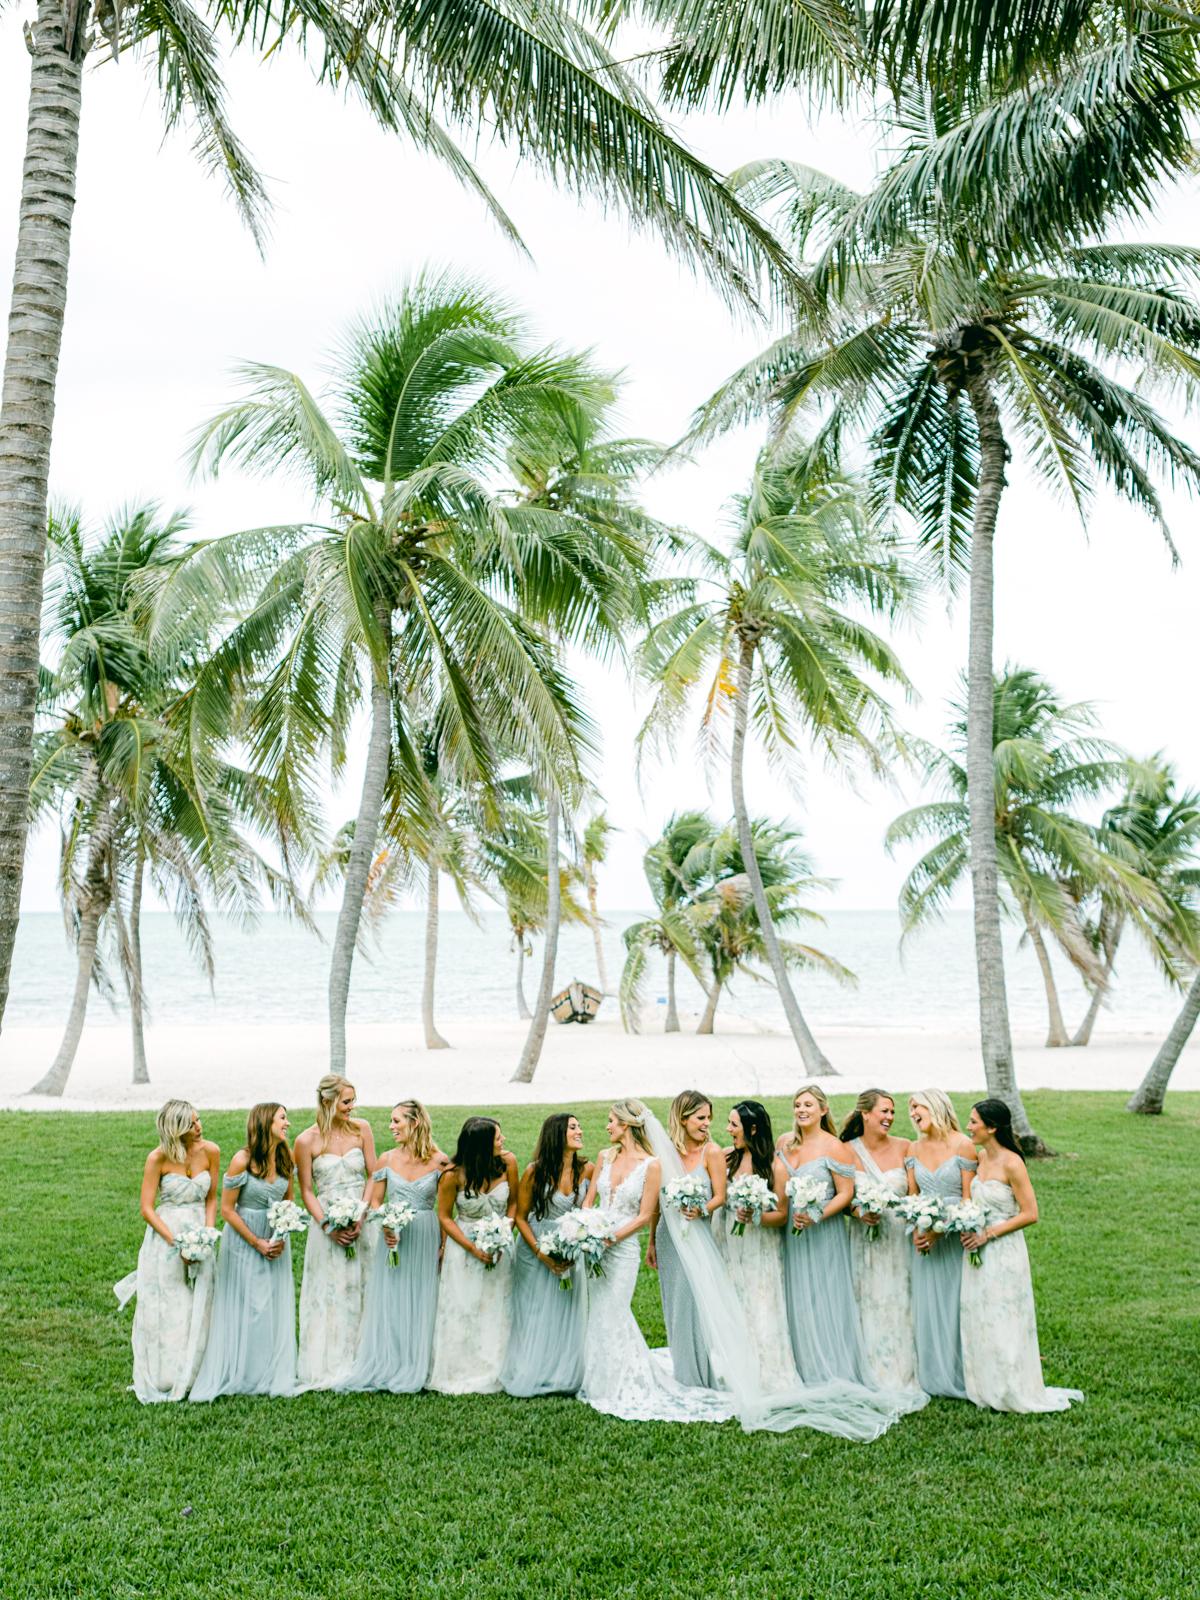 Islamorada Beach Wedding Featured on Carats and Cake